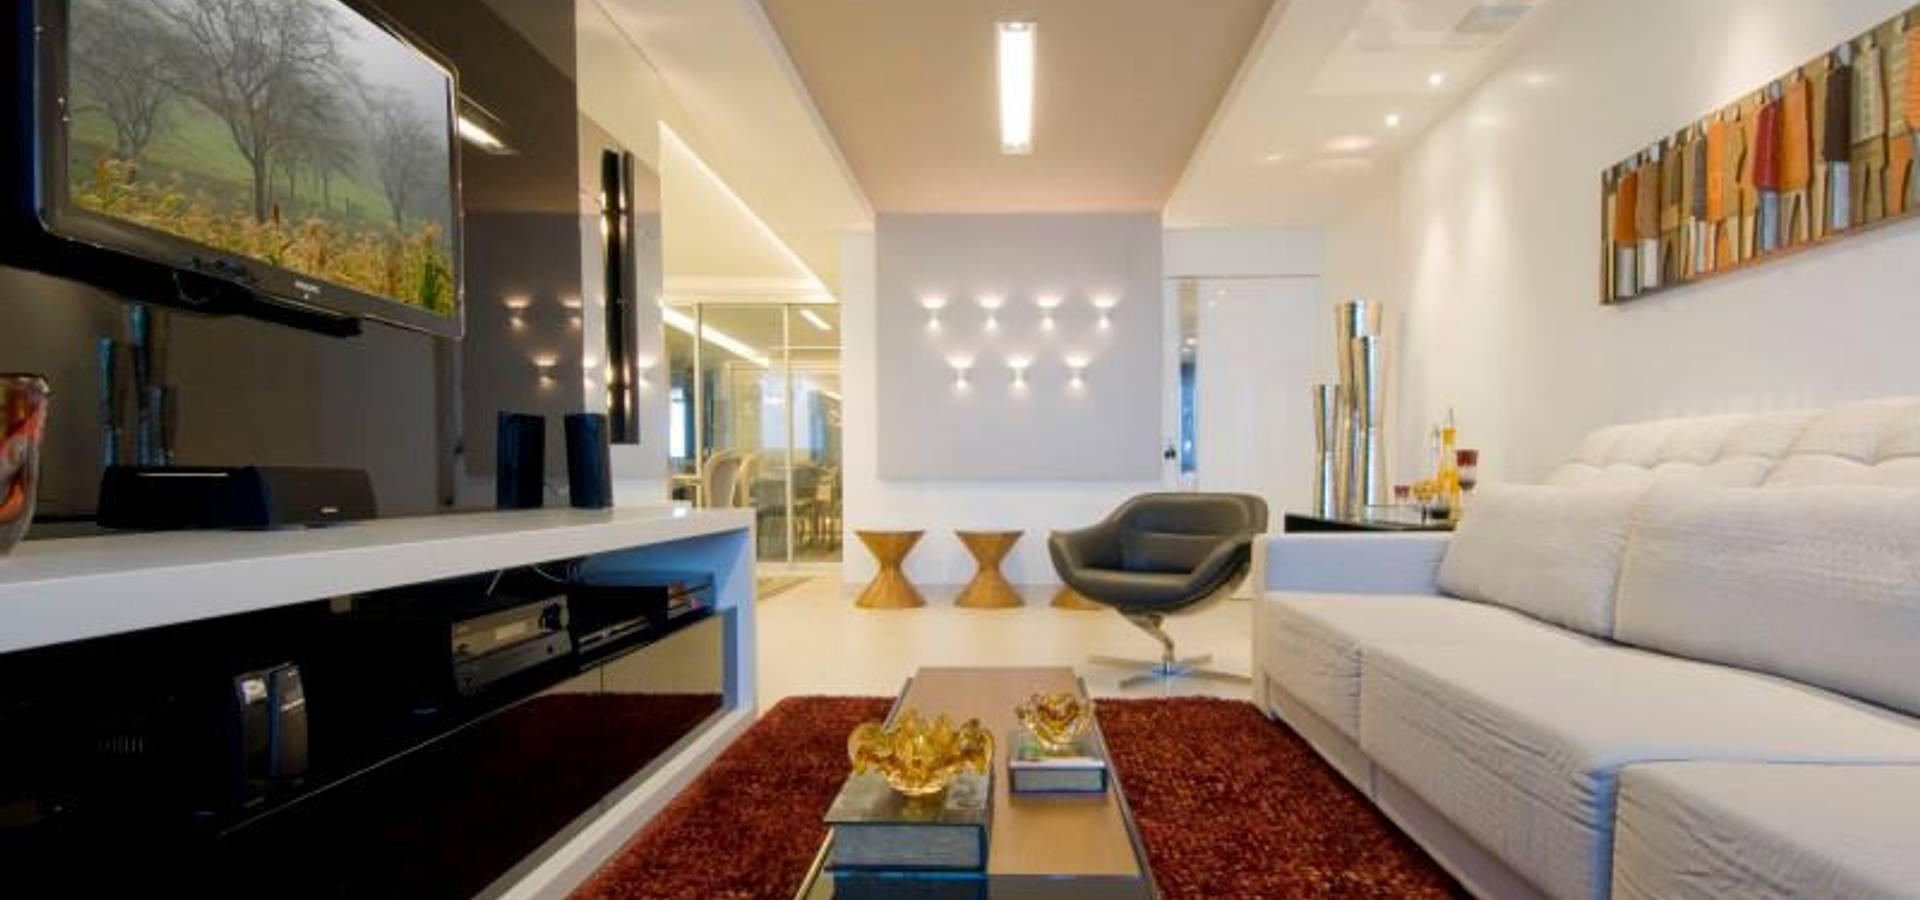 Allysandra Delmas – Arquitetura e Interiores